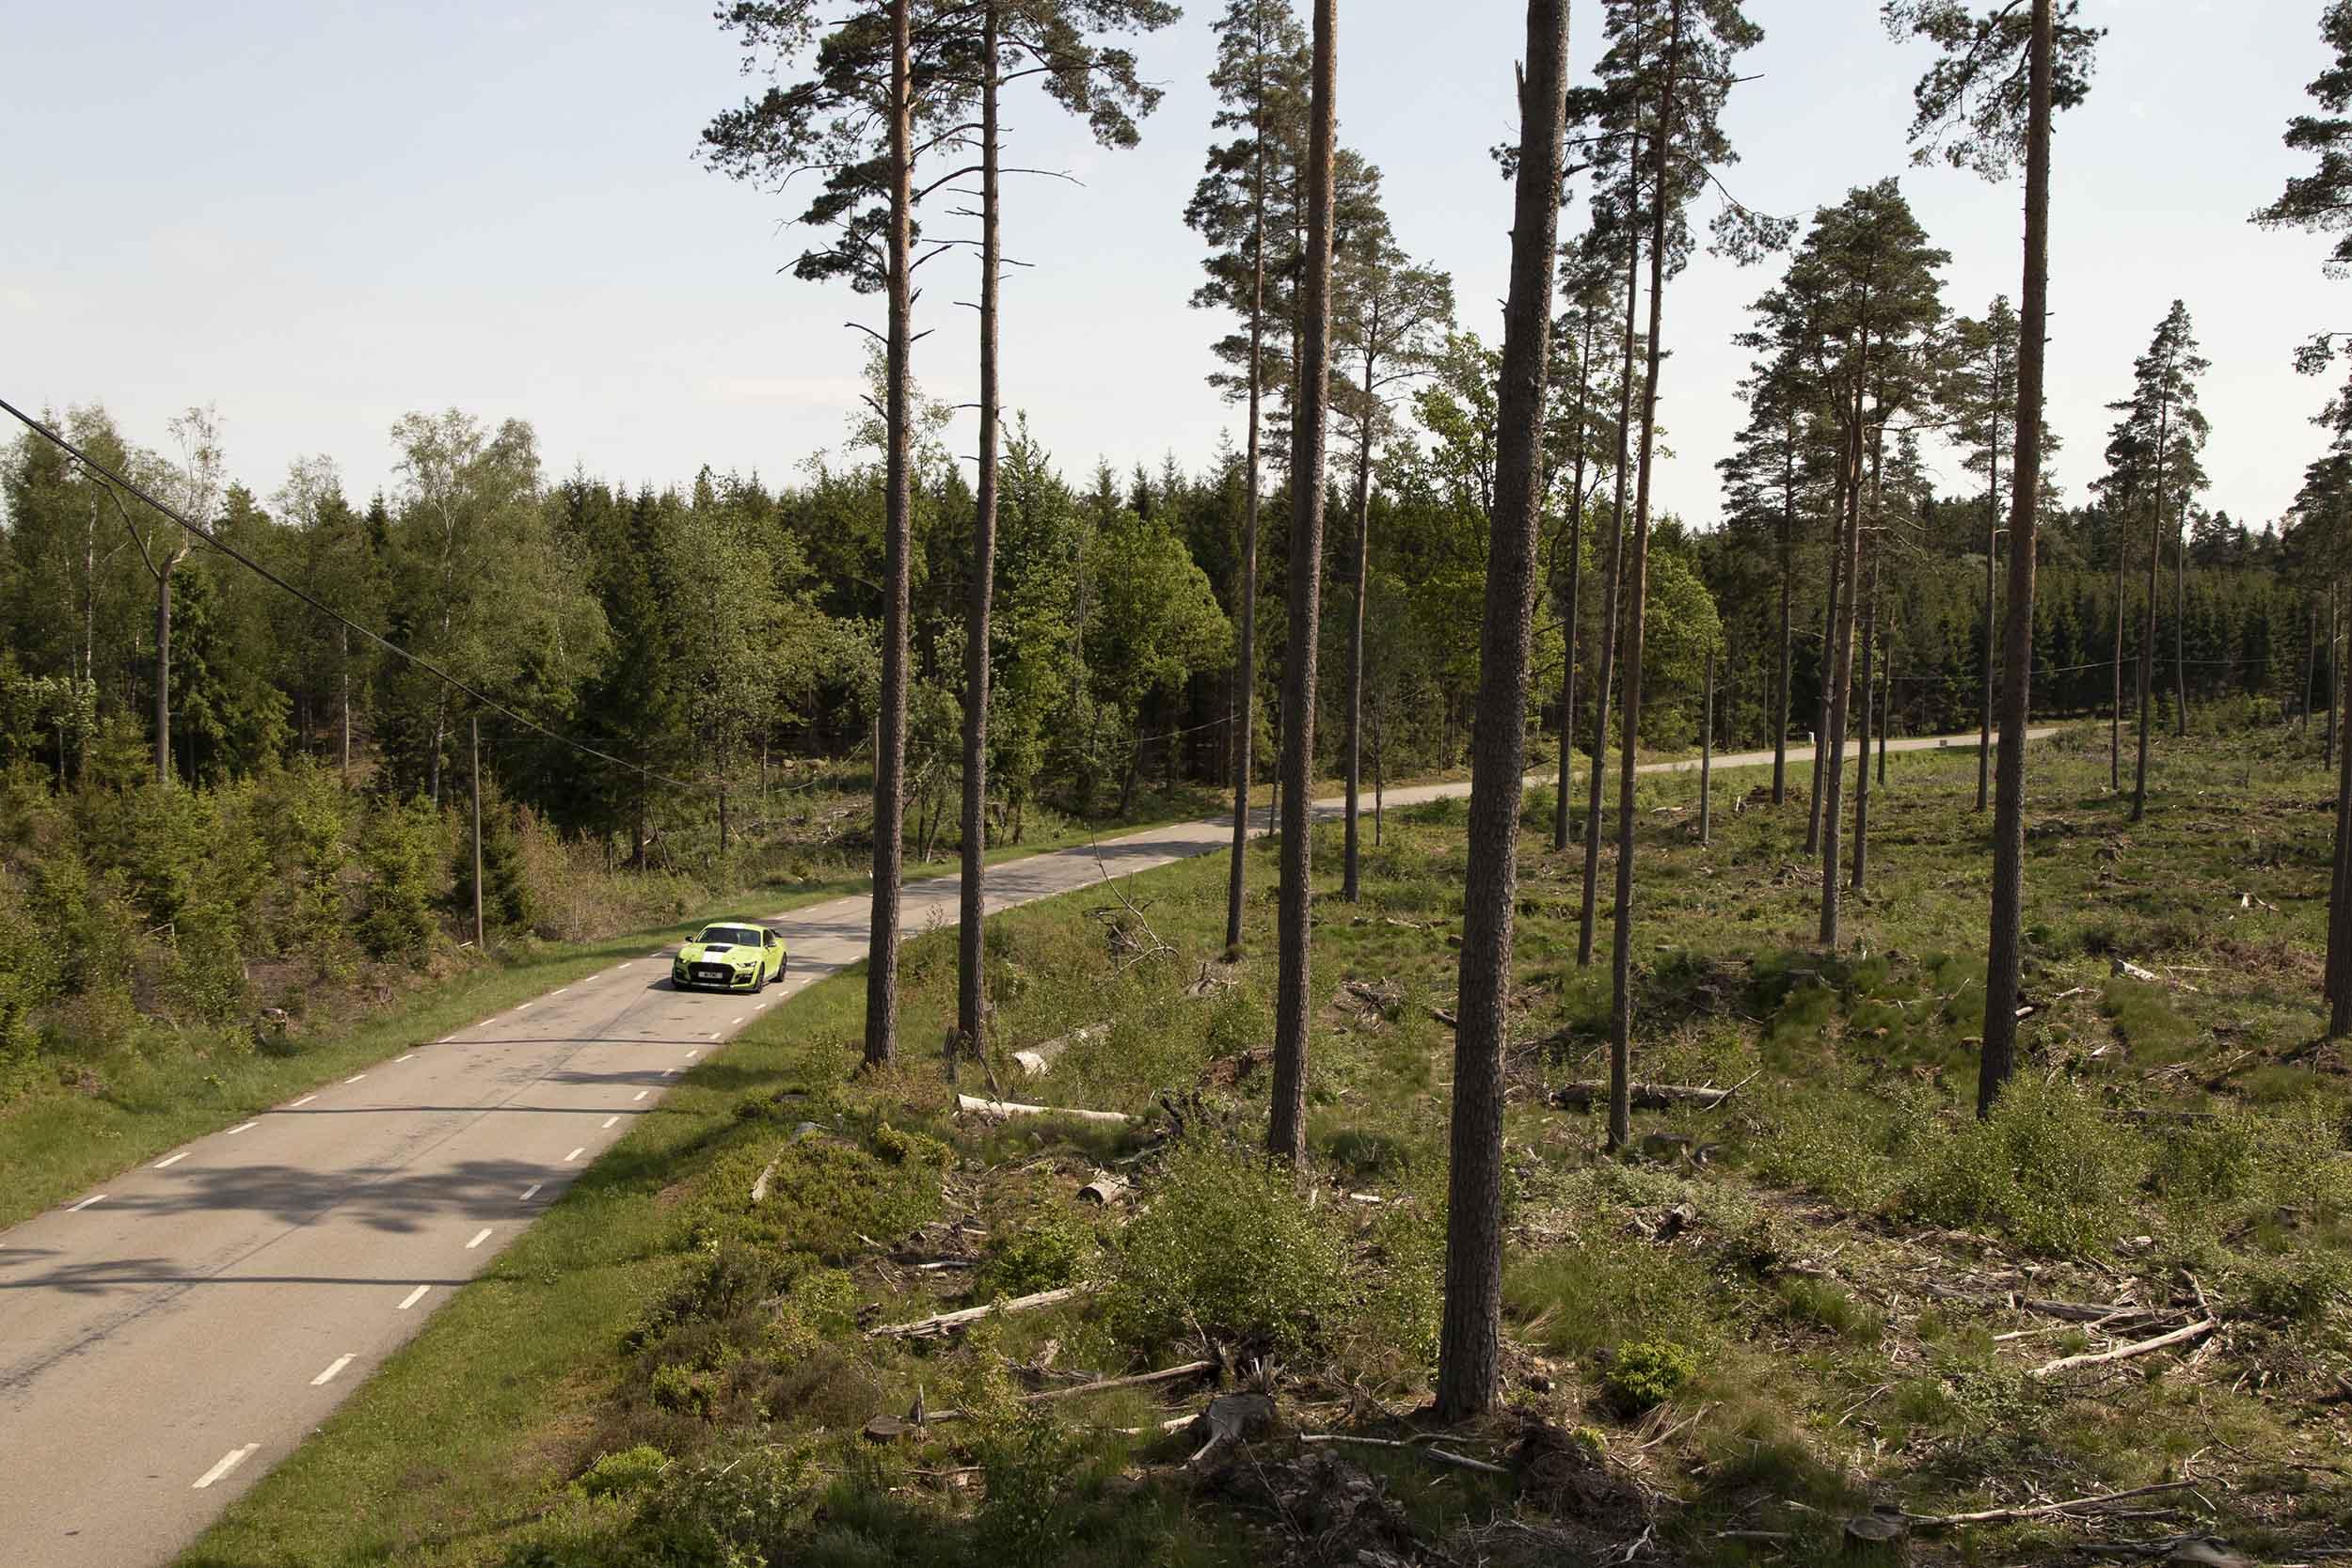 Ford Mustang Shelby GT500 rijdt tussen de bomen